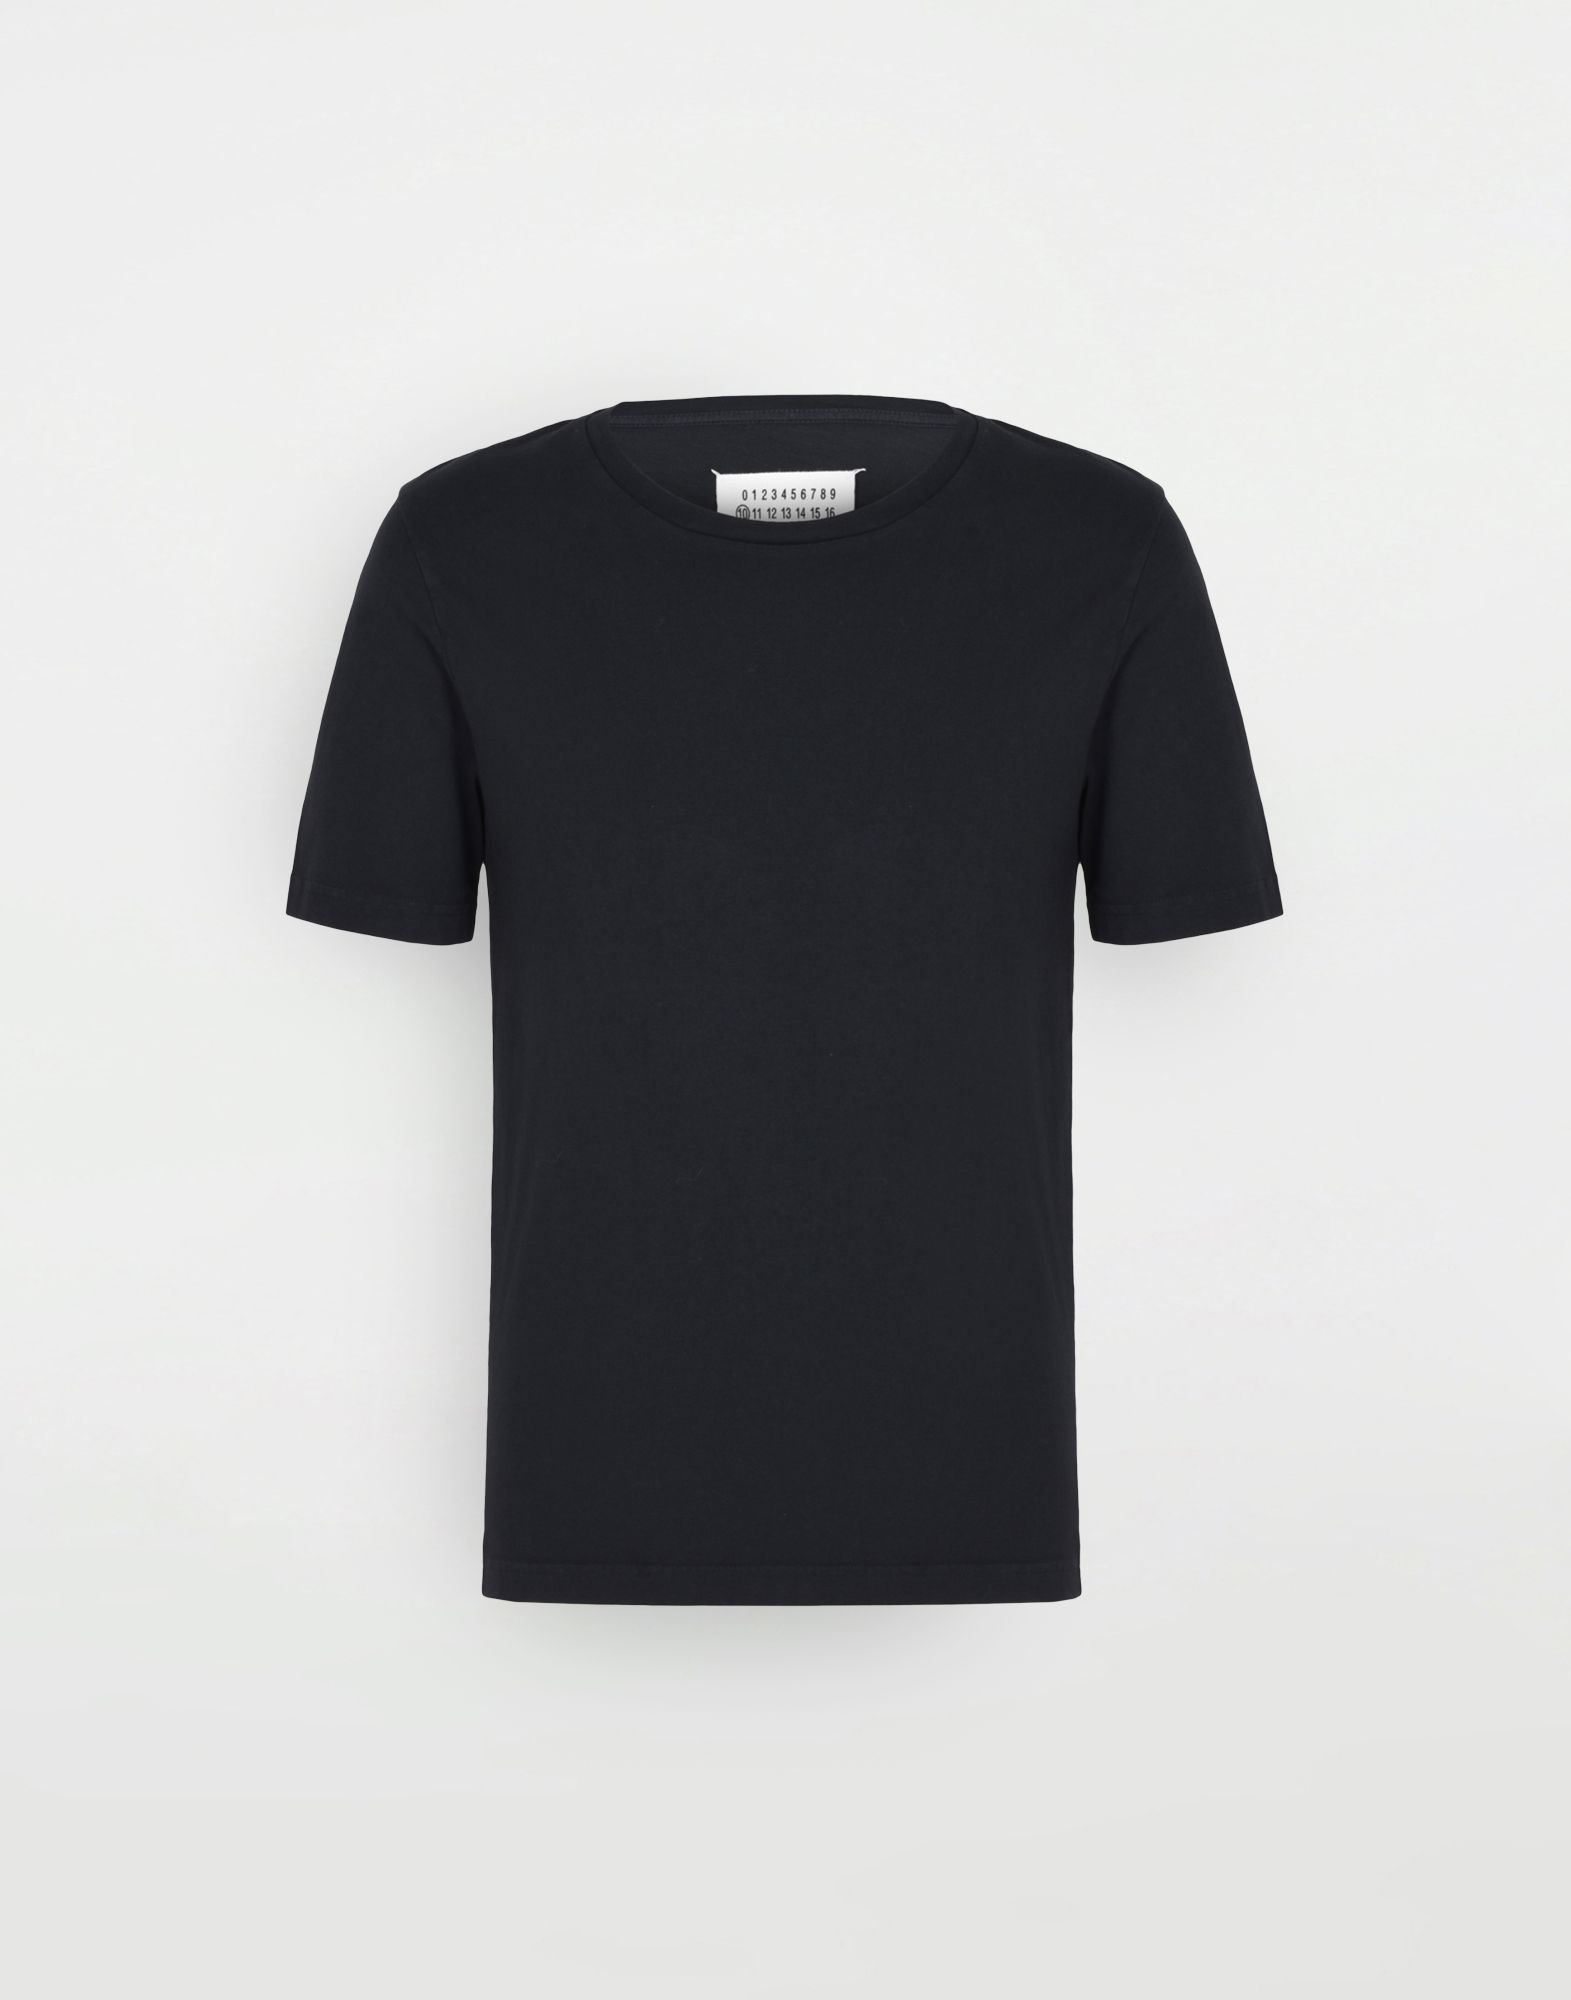 MAISON MARGIELA Cotton tee-shirt Short sleeve t-shirt Man f